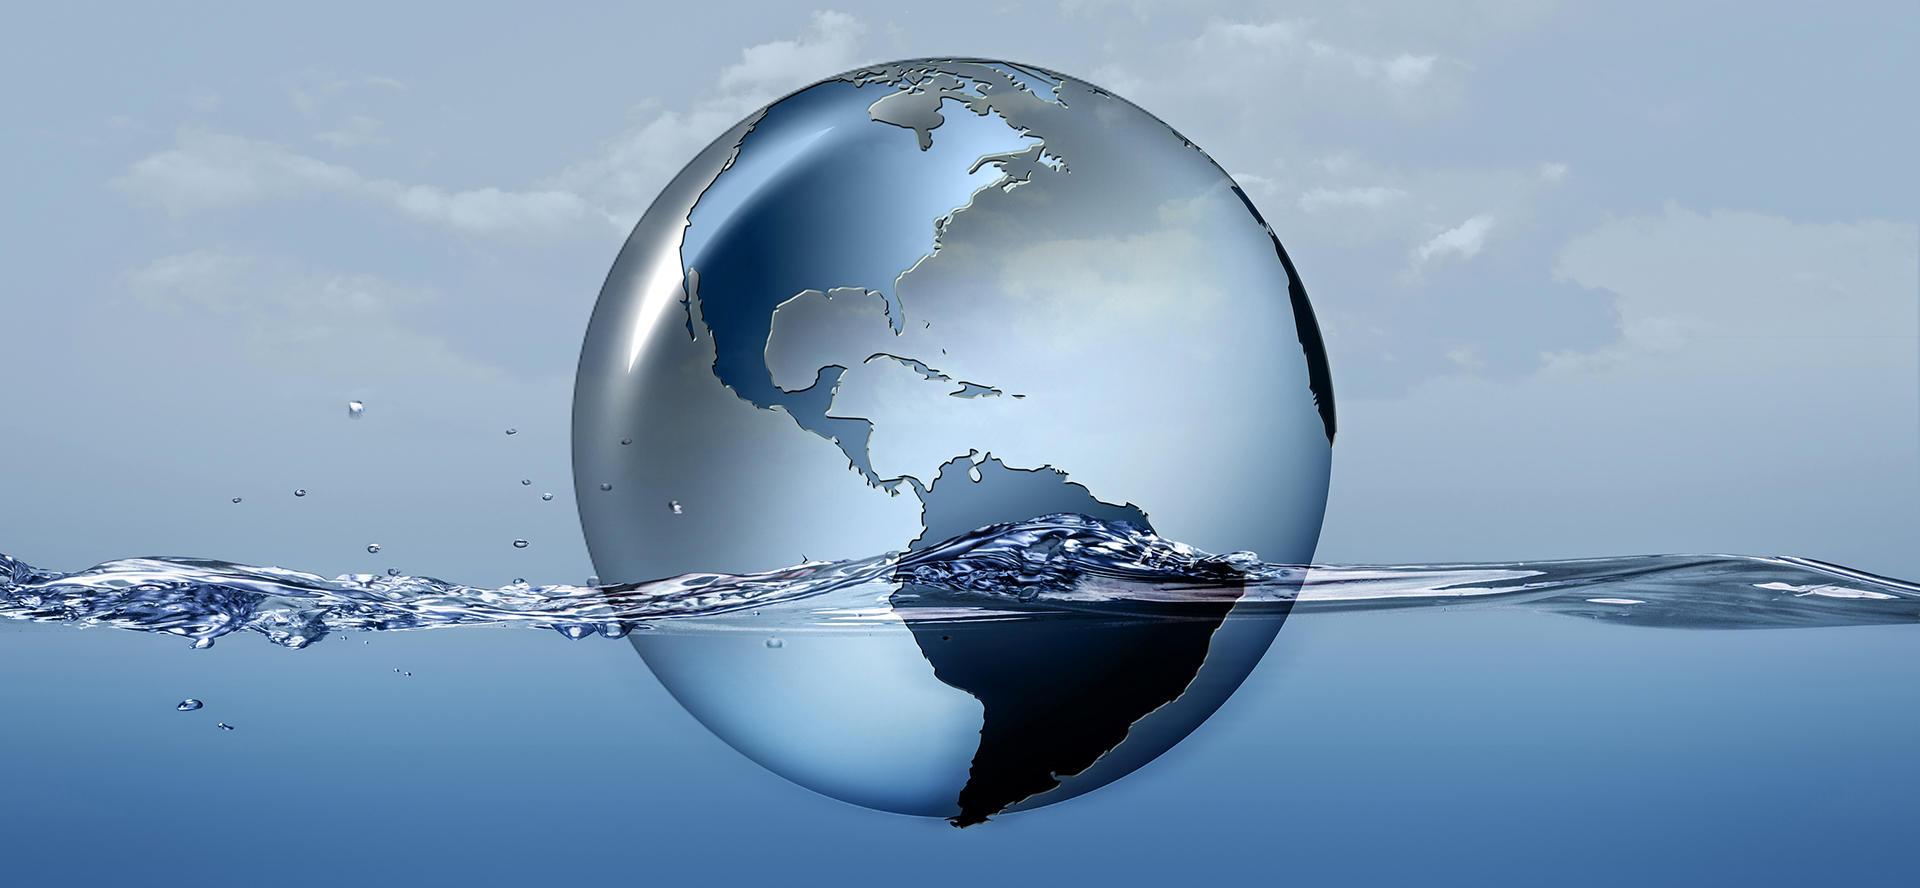 Insula hållbarhet